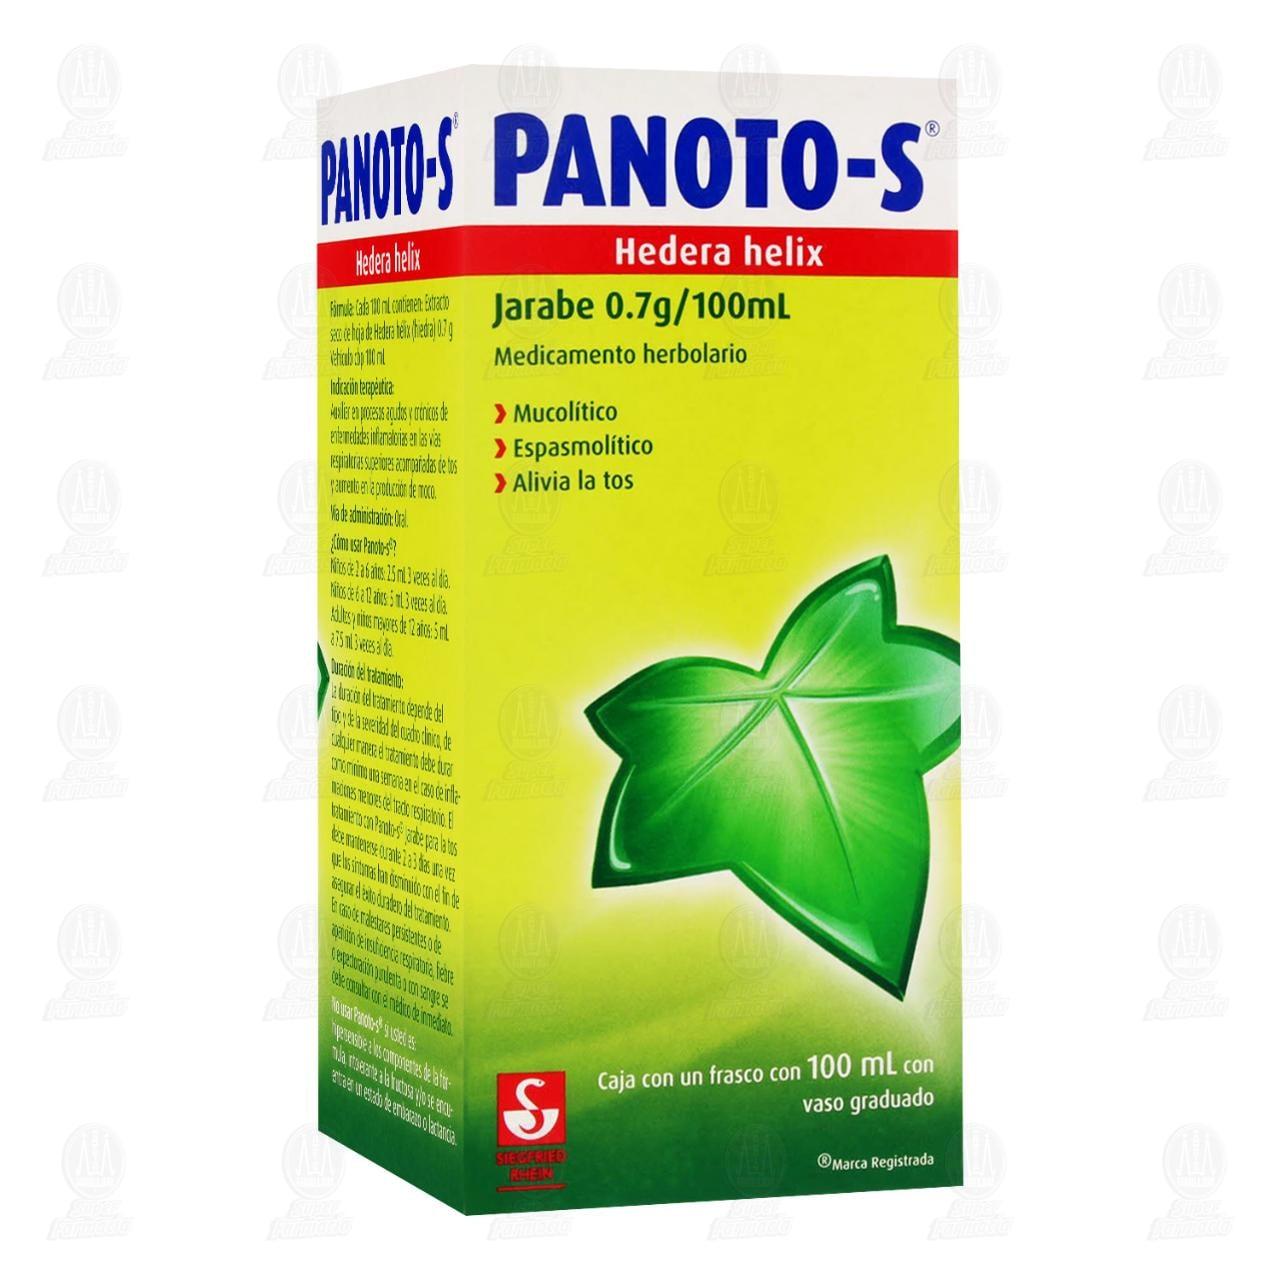 Comprar Panoto-S Jarabe 0.7gr/100ml en Farmacias Guadalajara